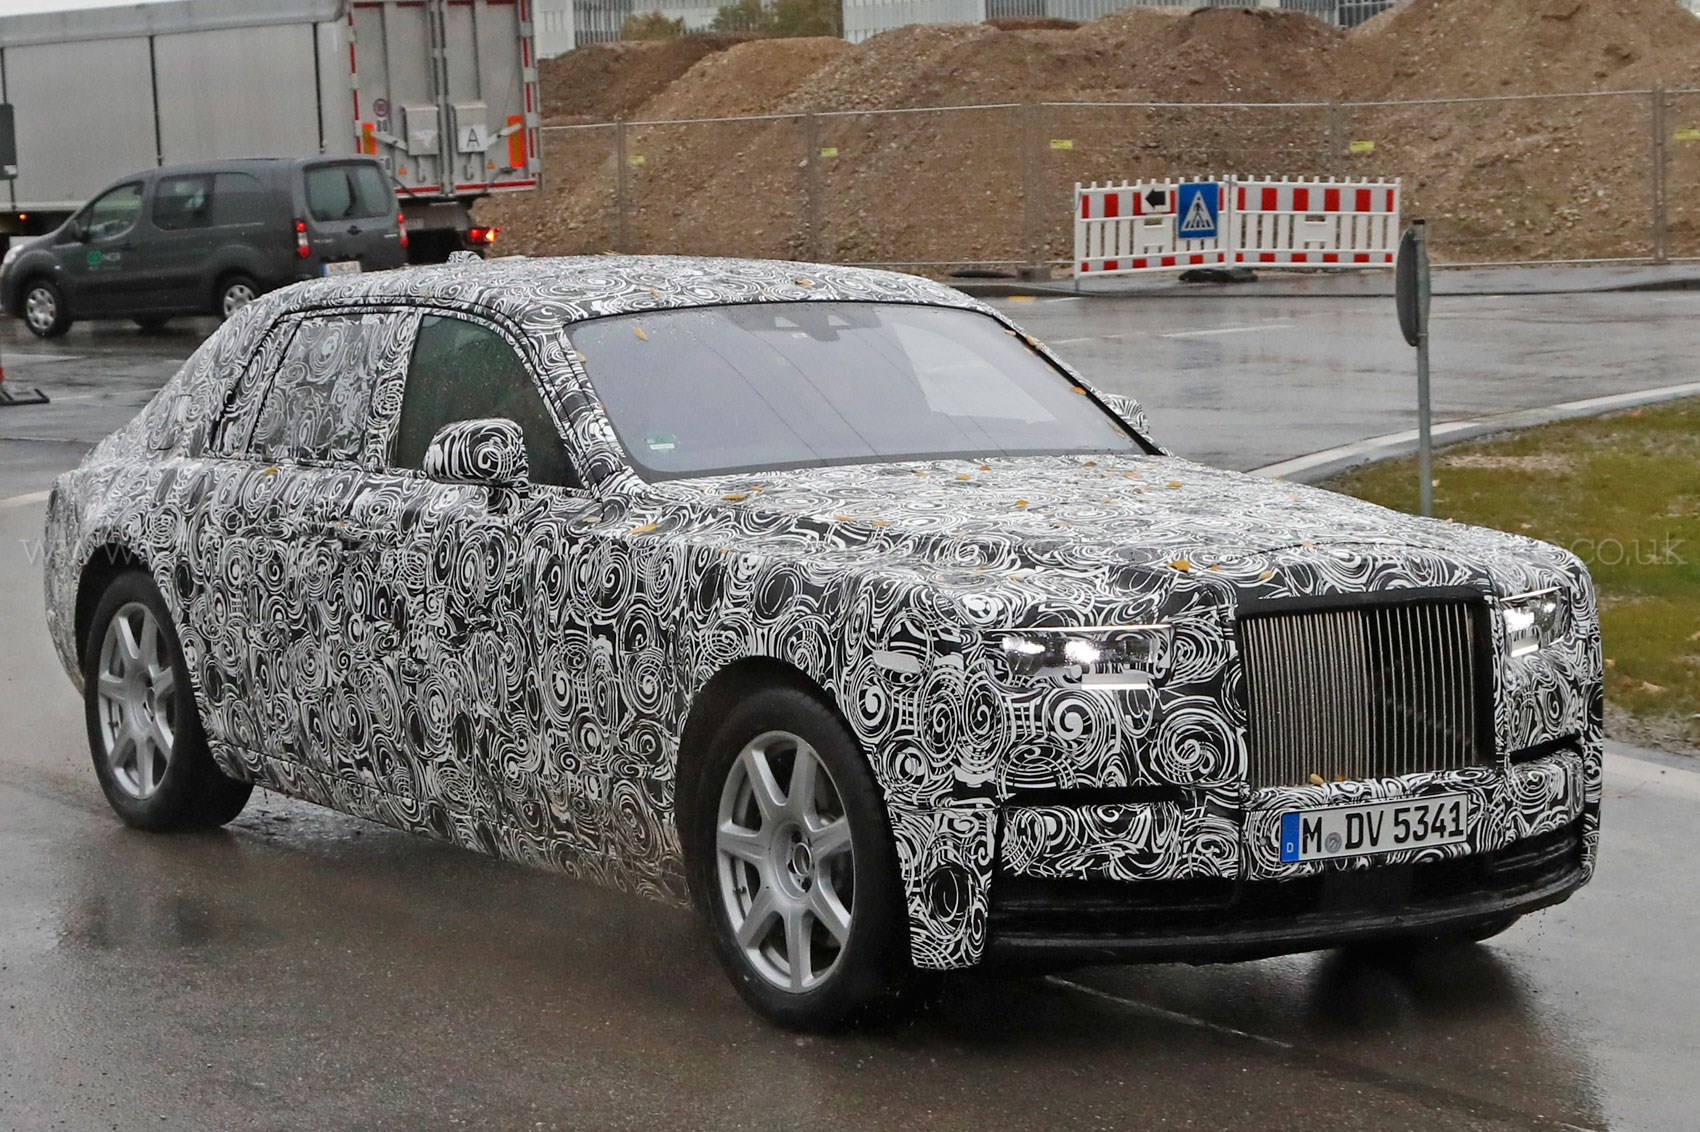 Permalink to Rolls Royces